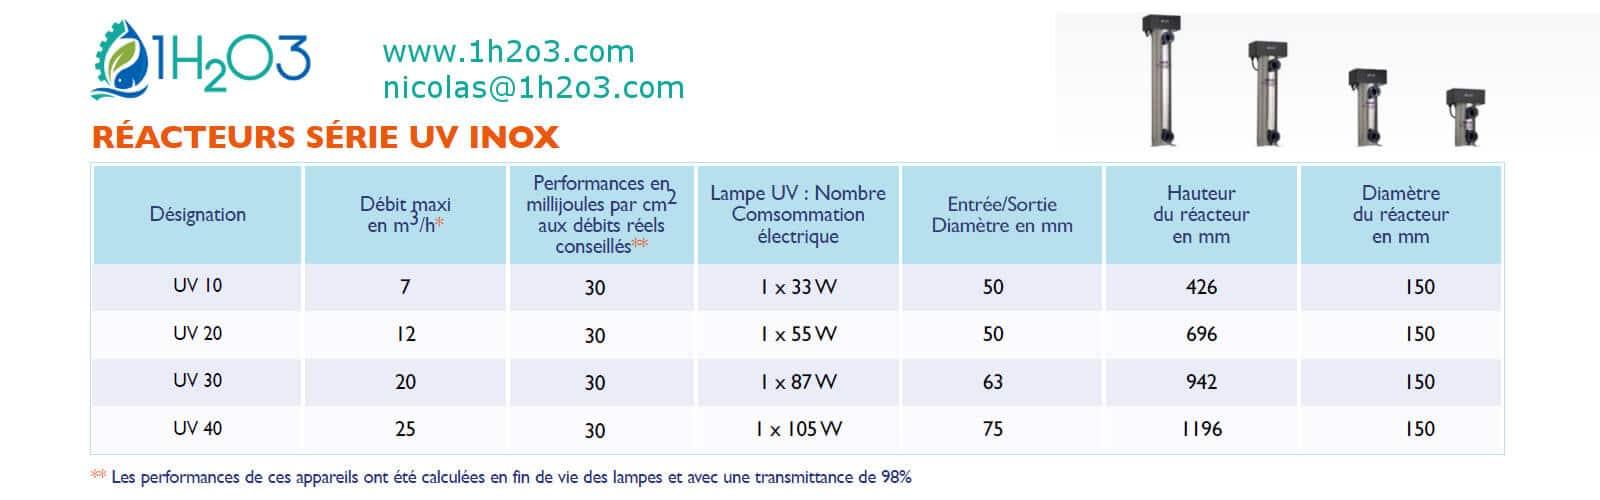 Réacteur désinfection UV eau douce gamme UV10 UV20 UV30 UV40 1h2o3